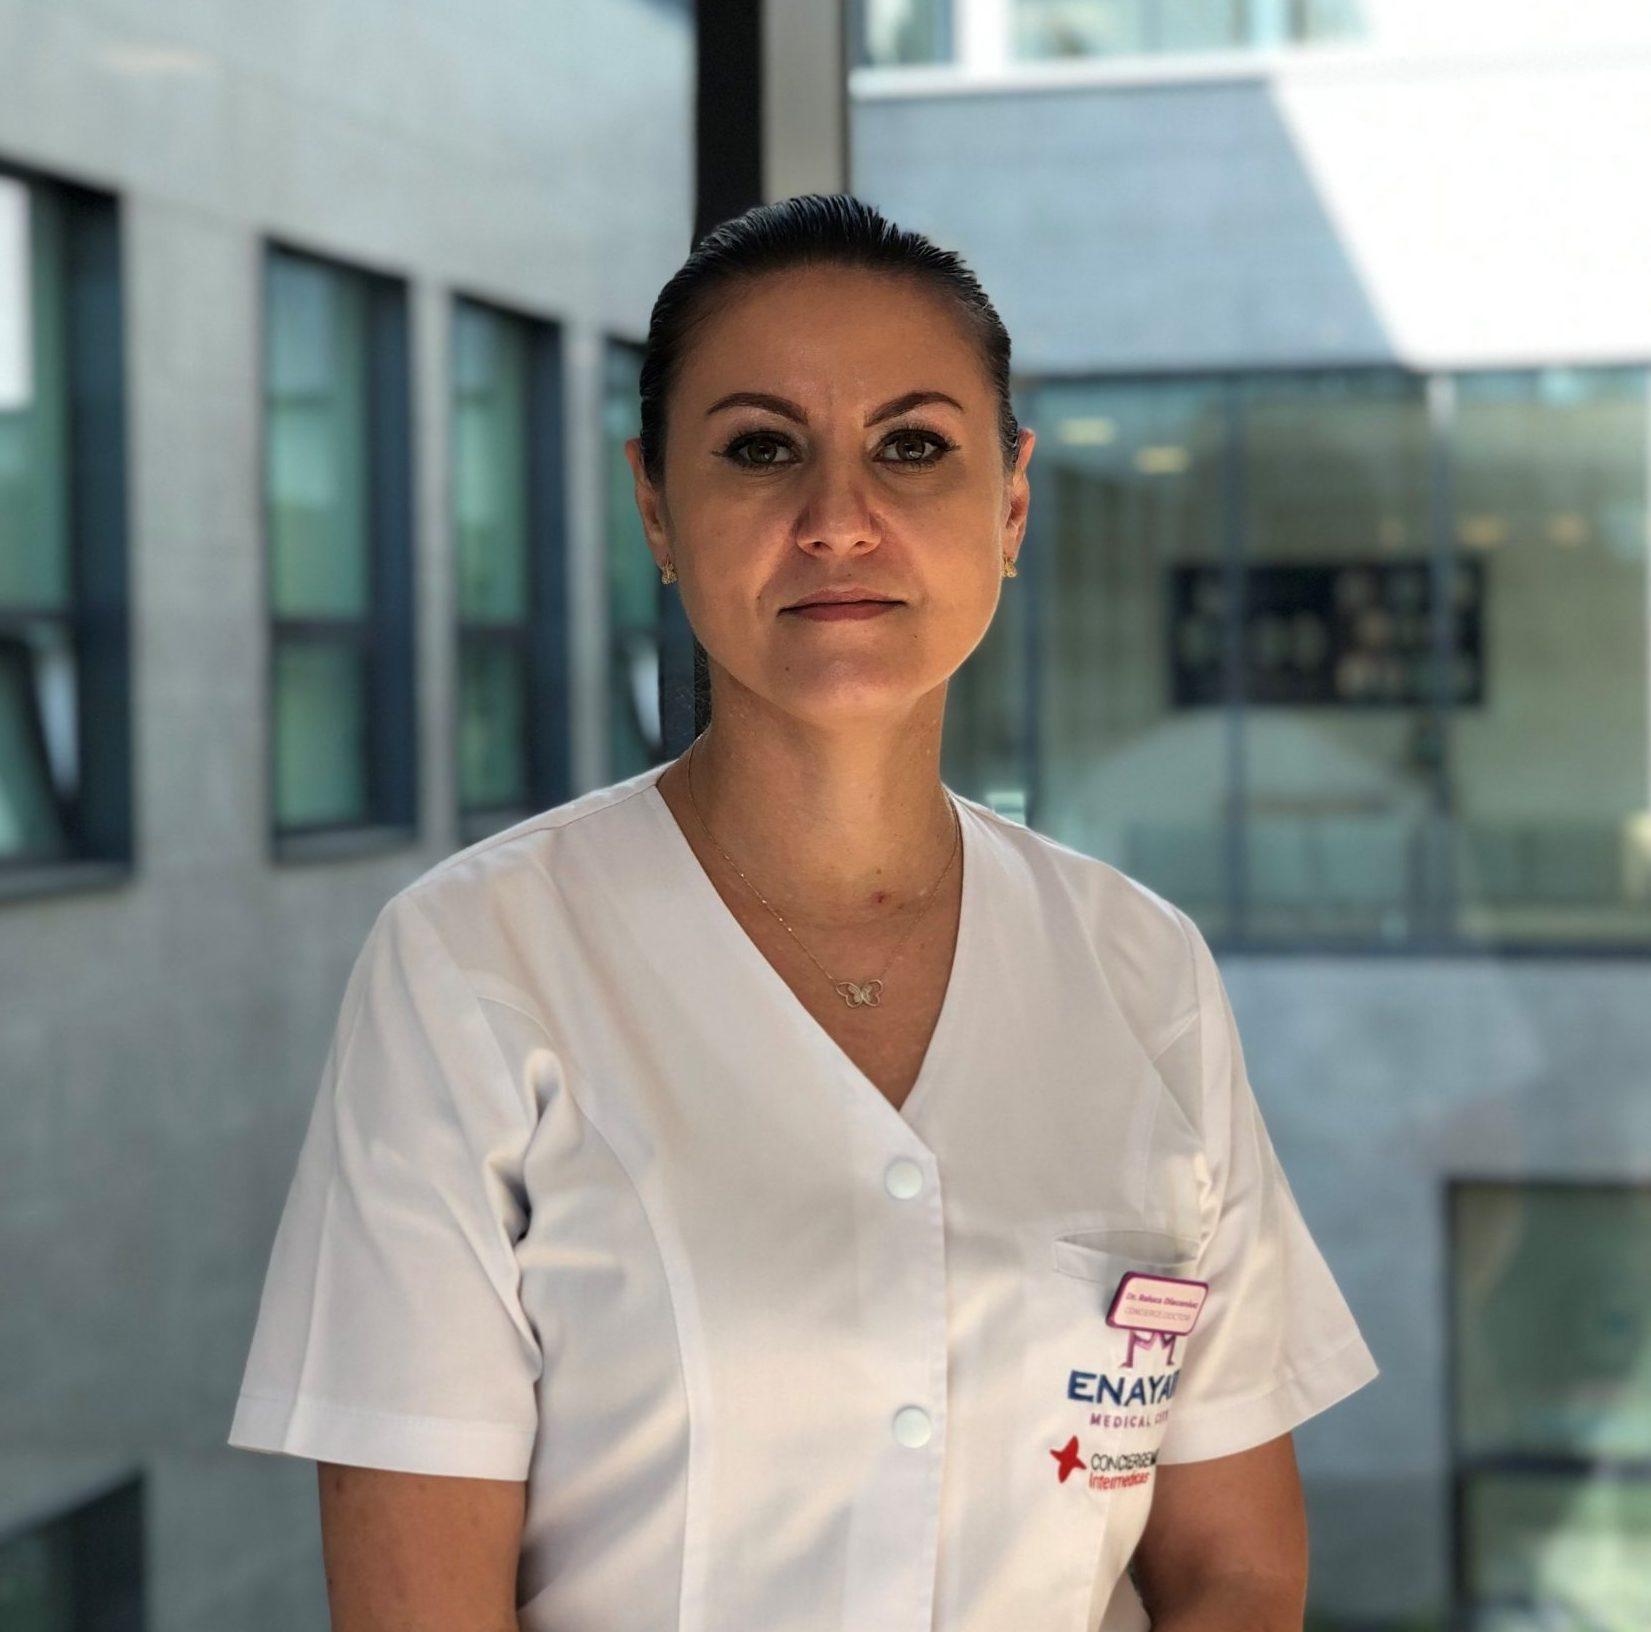 Dr. Raluca Diaconiuc